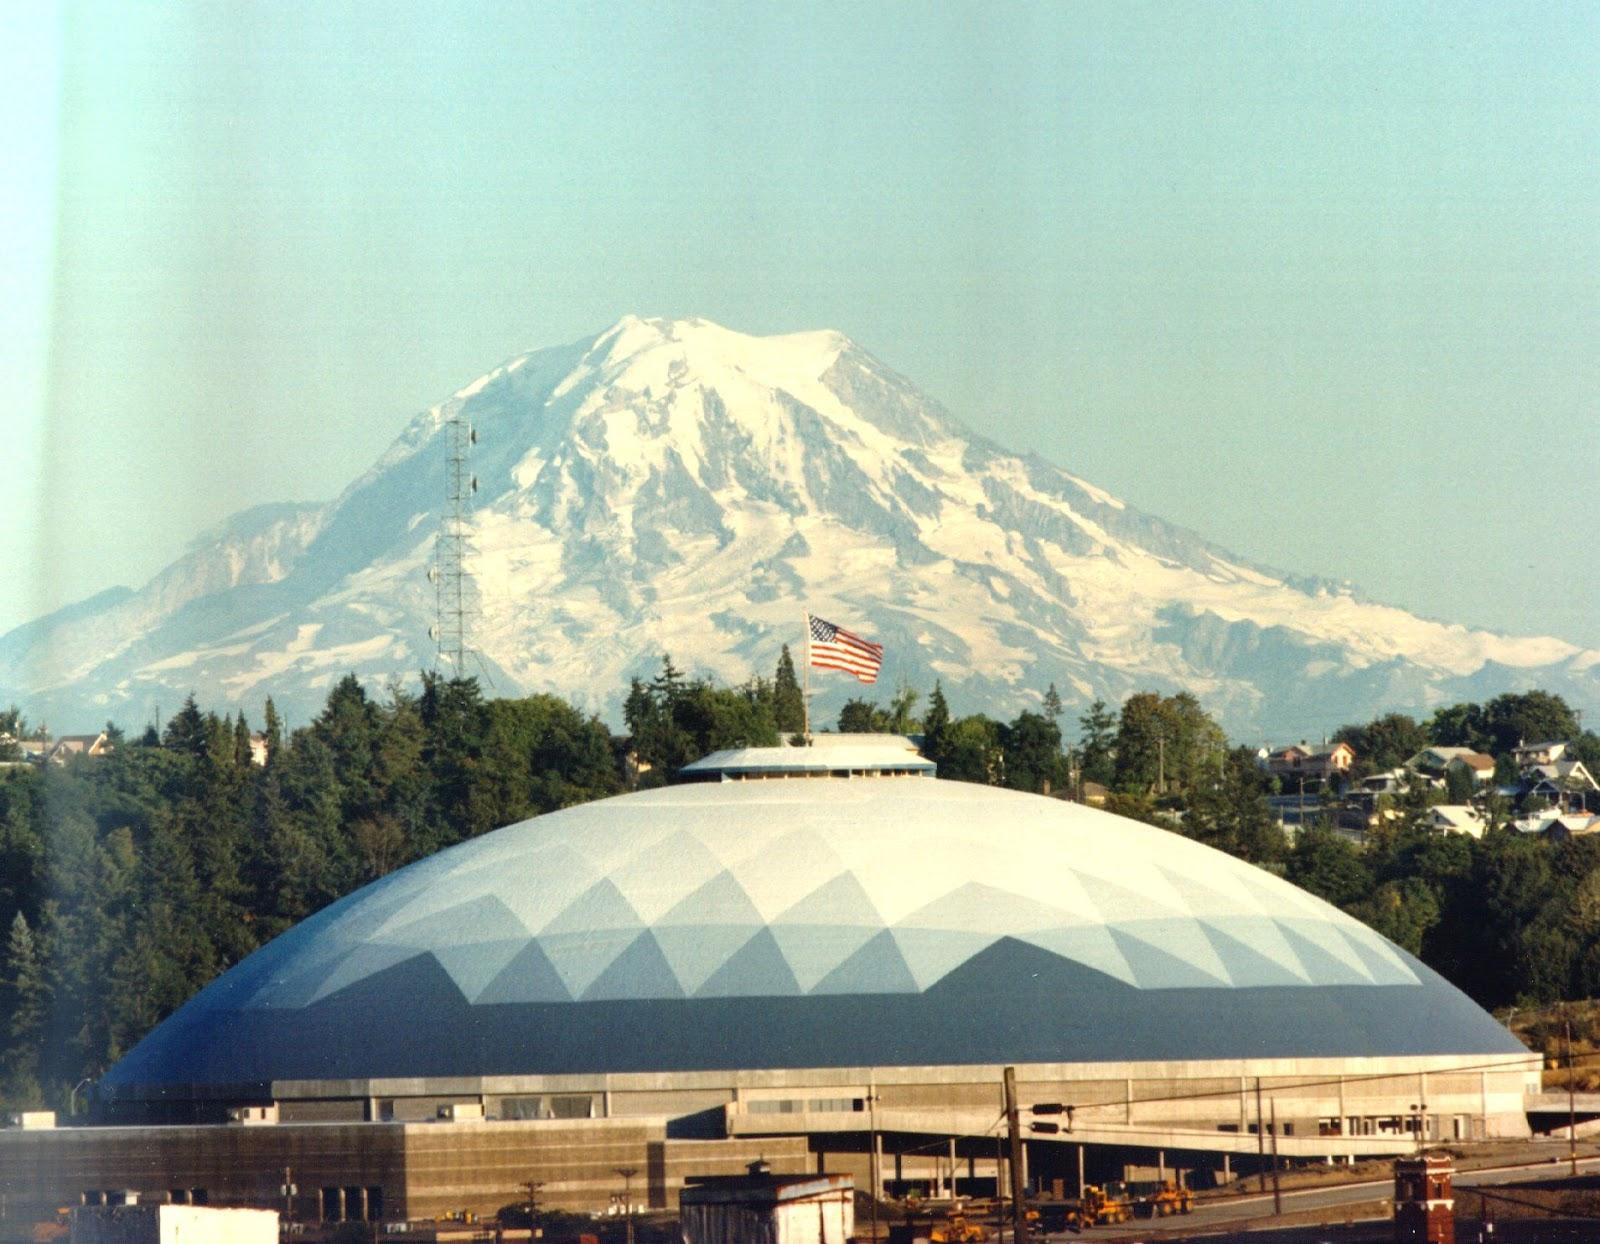 http://3.bp.blogspot.com/-j9JE6allW3c/UDzwWwW9ZMI/AAAAAAAAAV8/CyzaPtbqNUU/s1600/!tacoma+dome1++job+812050.bmp